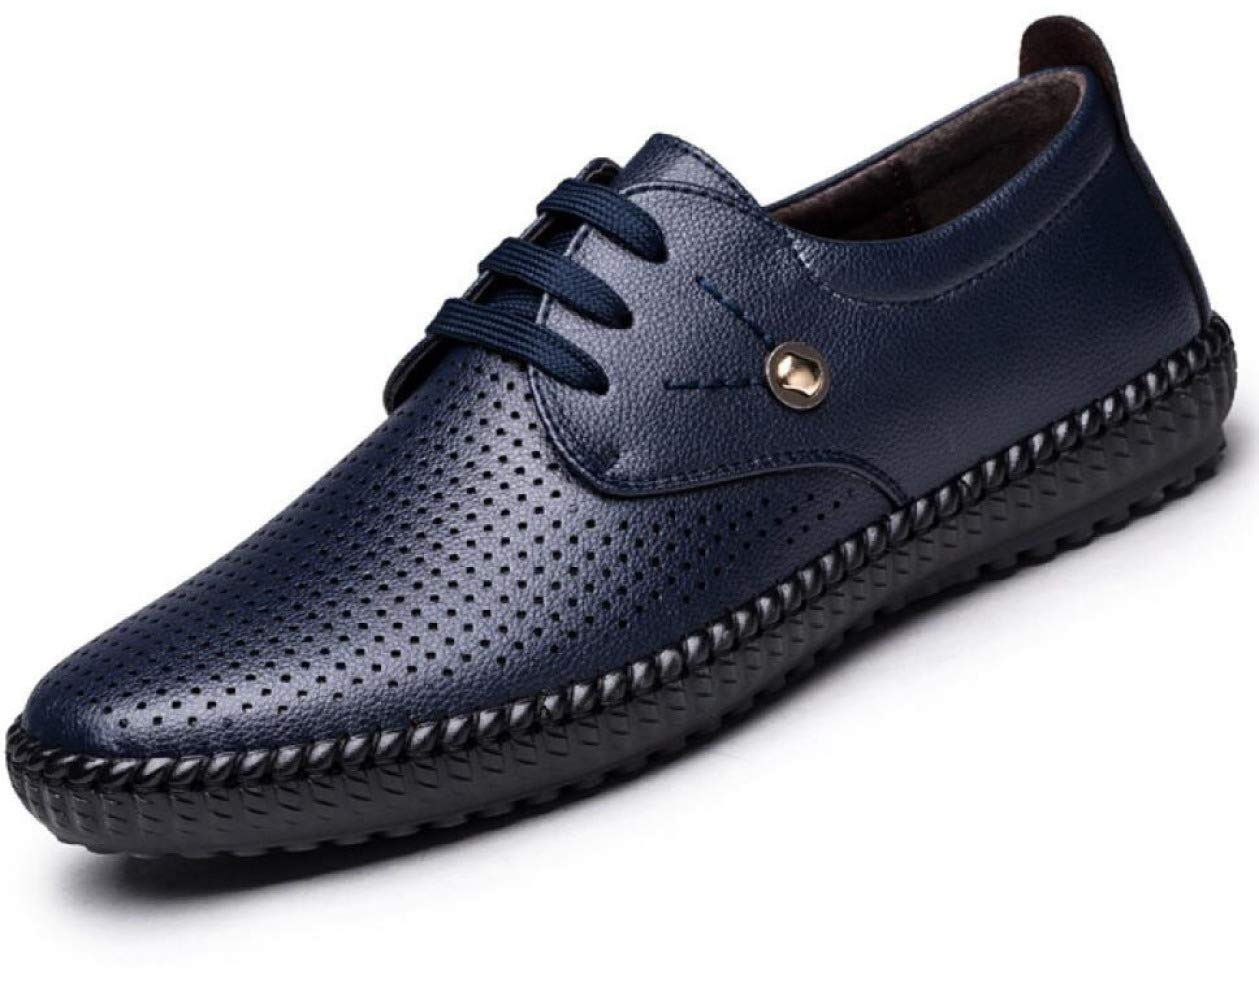 Verano Hueco Sandalias Cordones Zapatos Casuales Transpirables Zapatos Individuales 39 EU|Blue